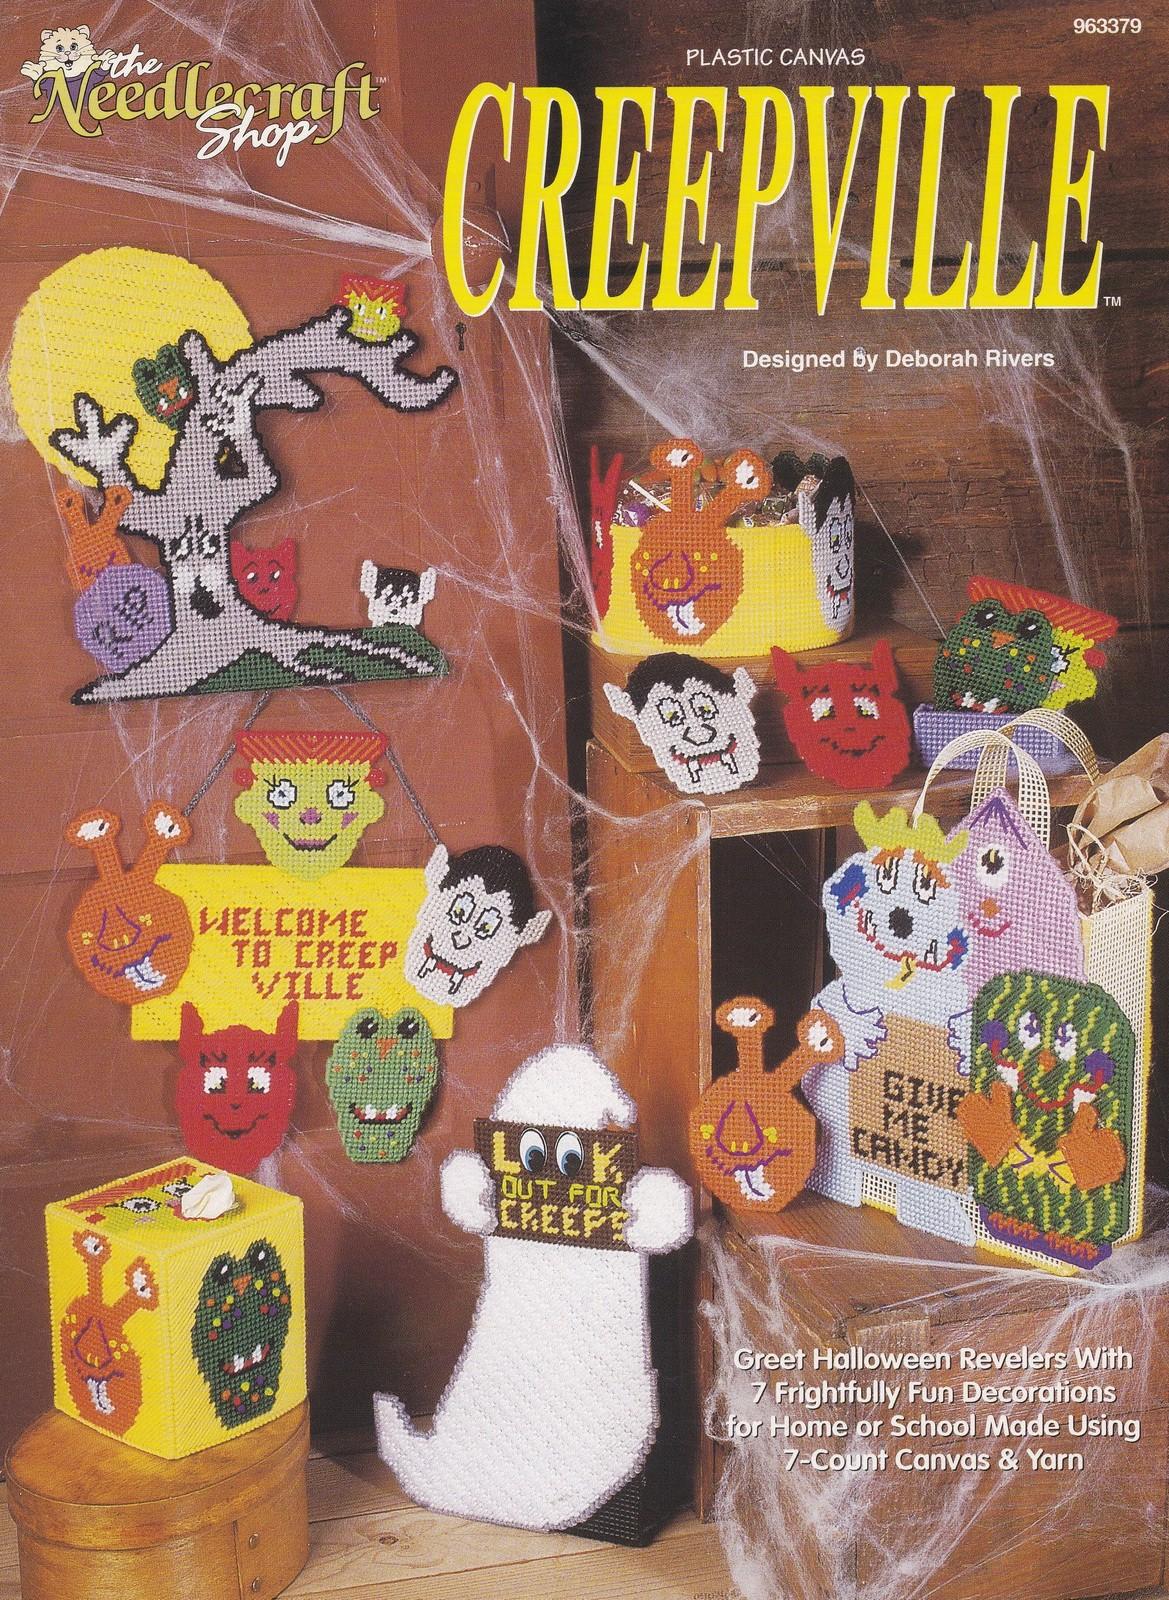 the needlecraft shop cross stitch pattern (1990s): 1 listing